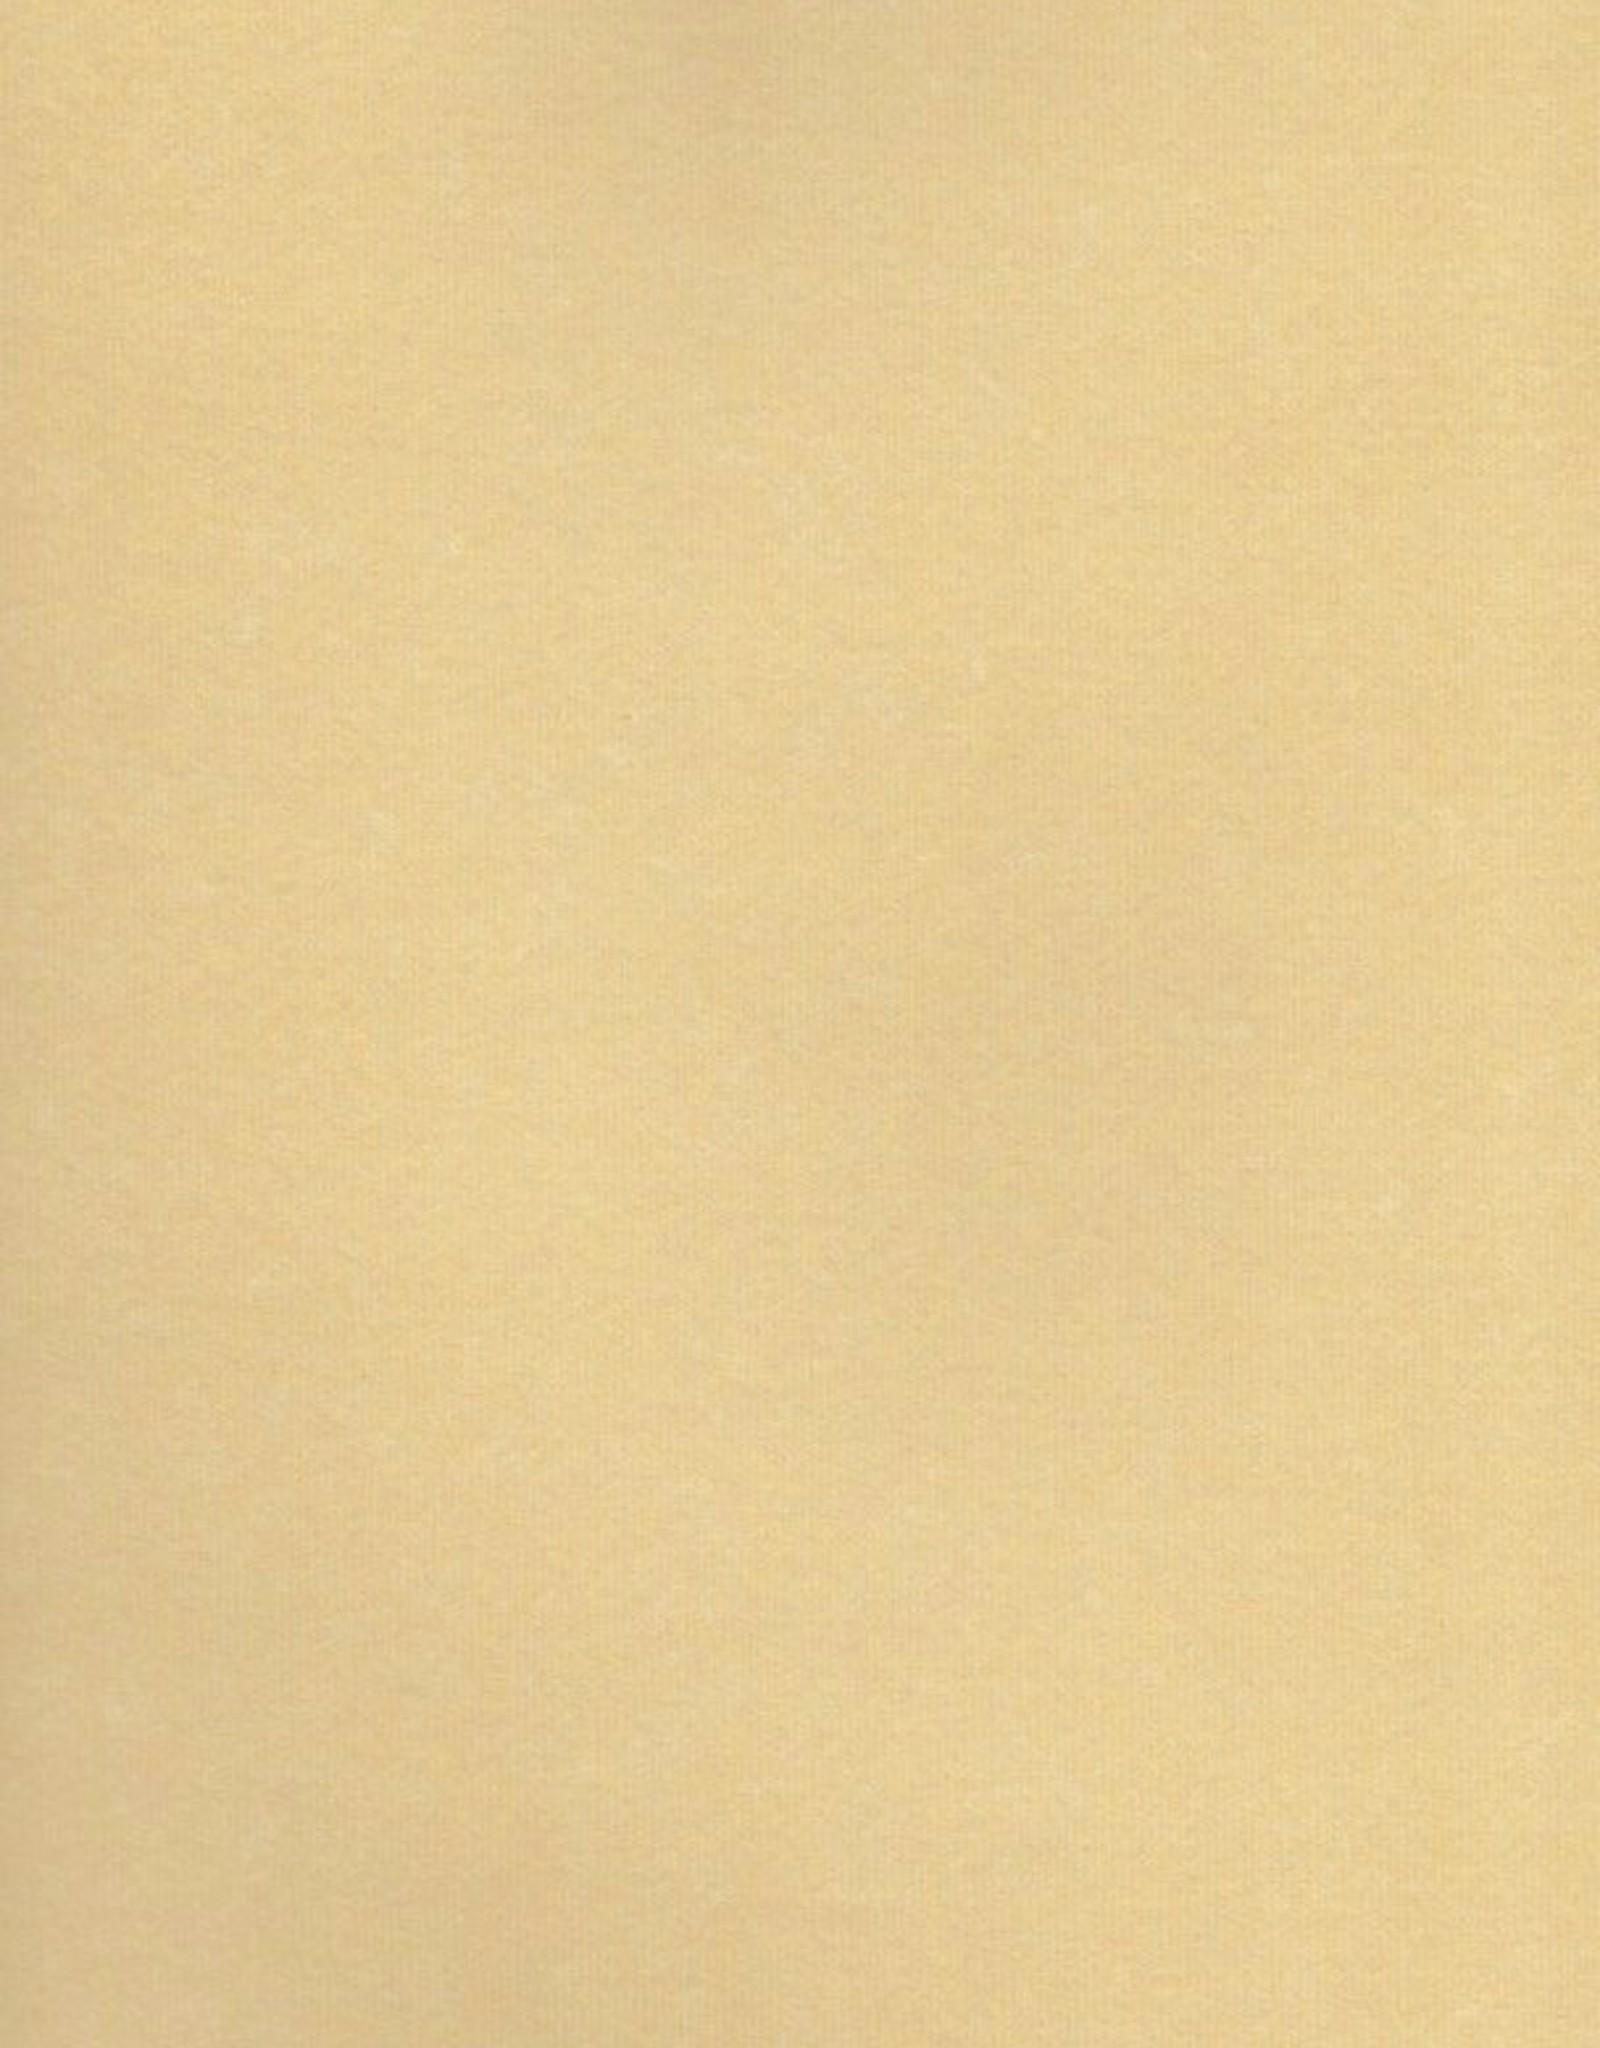 "Fabriano Vice Versa (Elle Erre), Wheat, 20"" x 27.5"", 220gsm / 135#"